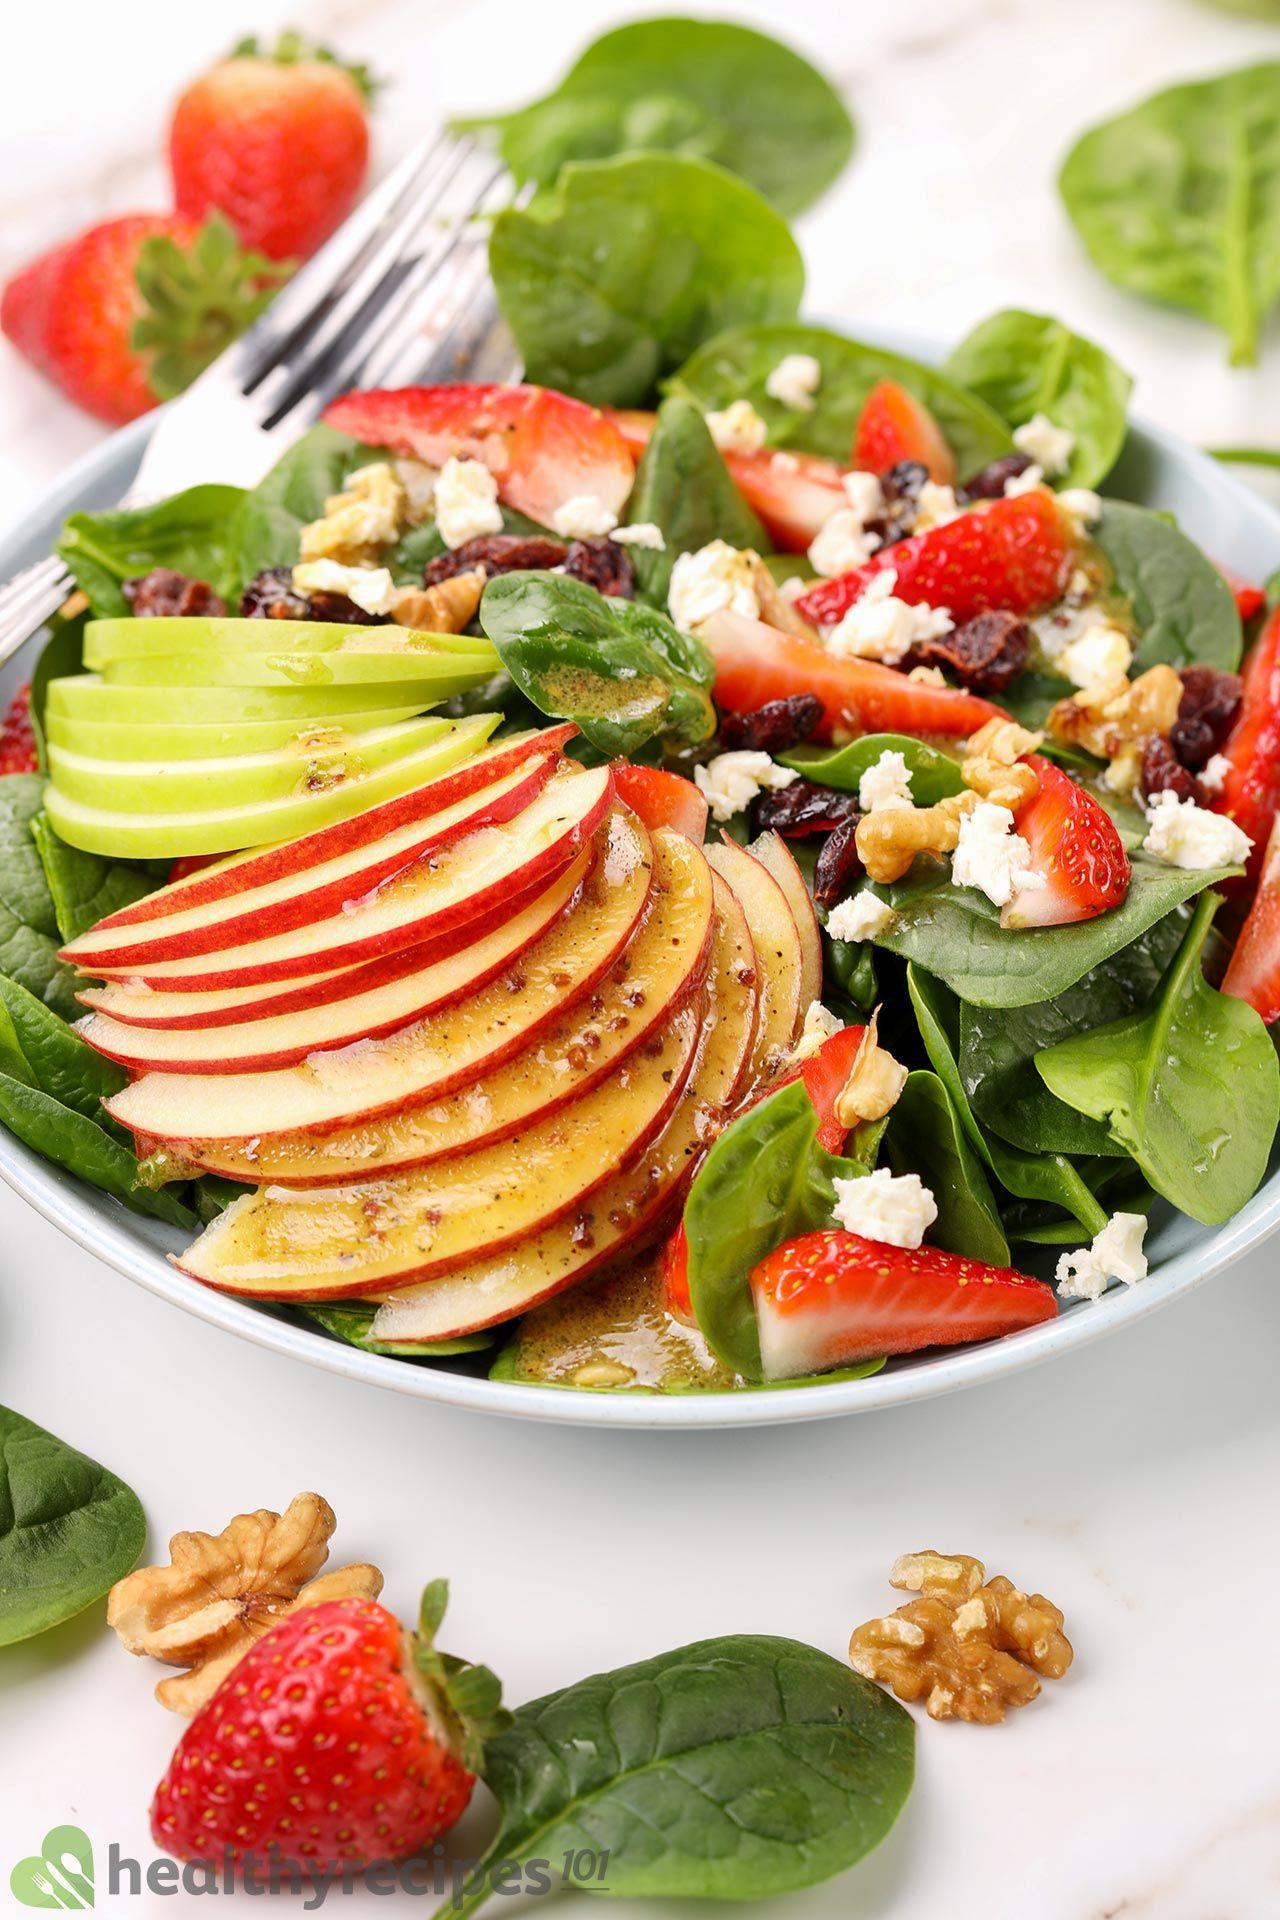 homemade spinach salad recipe